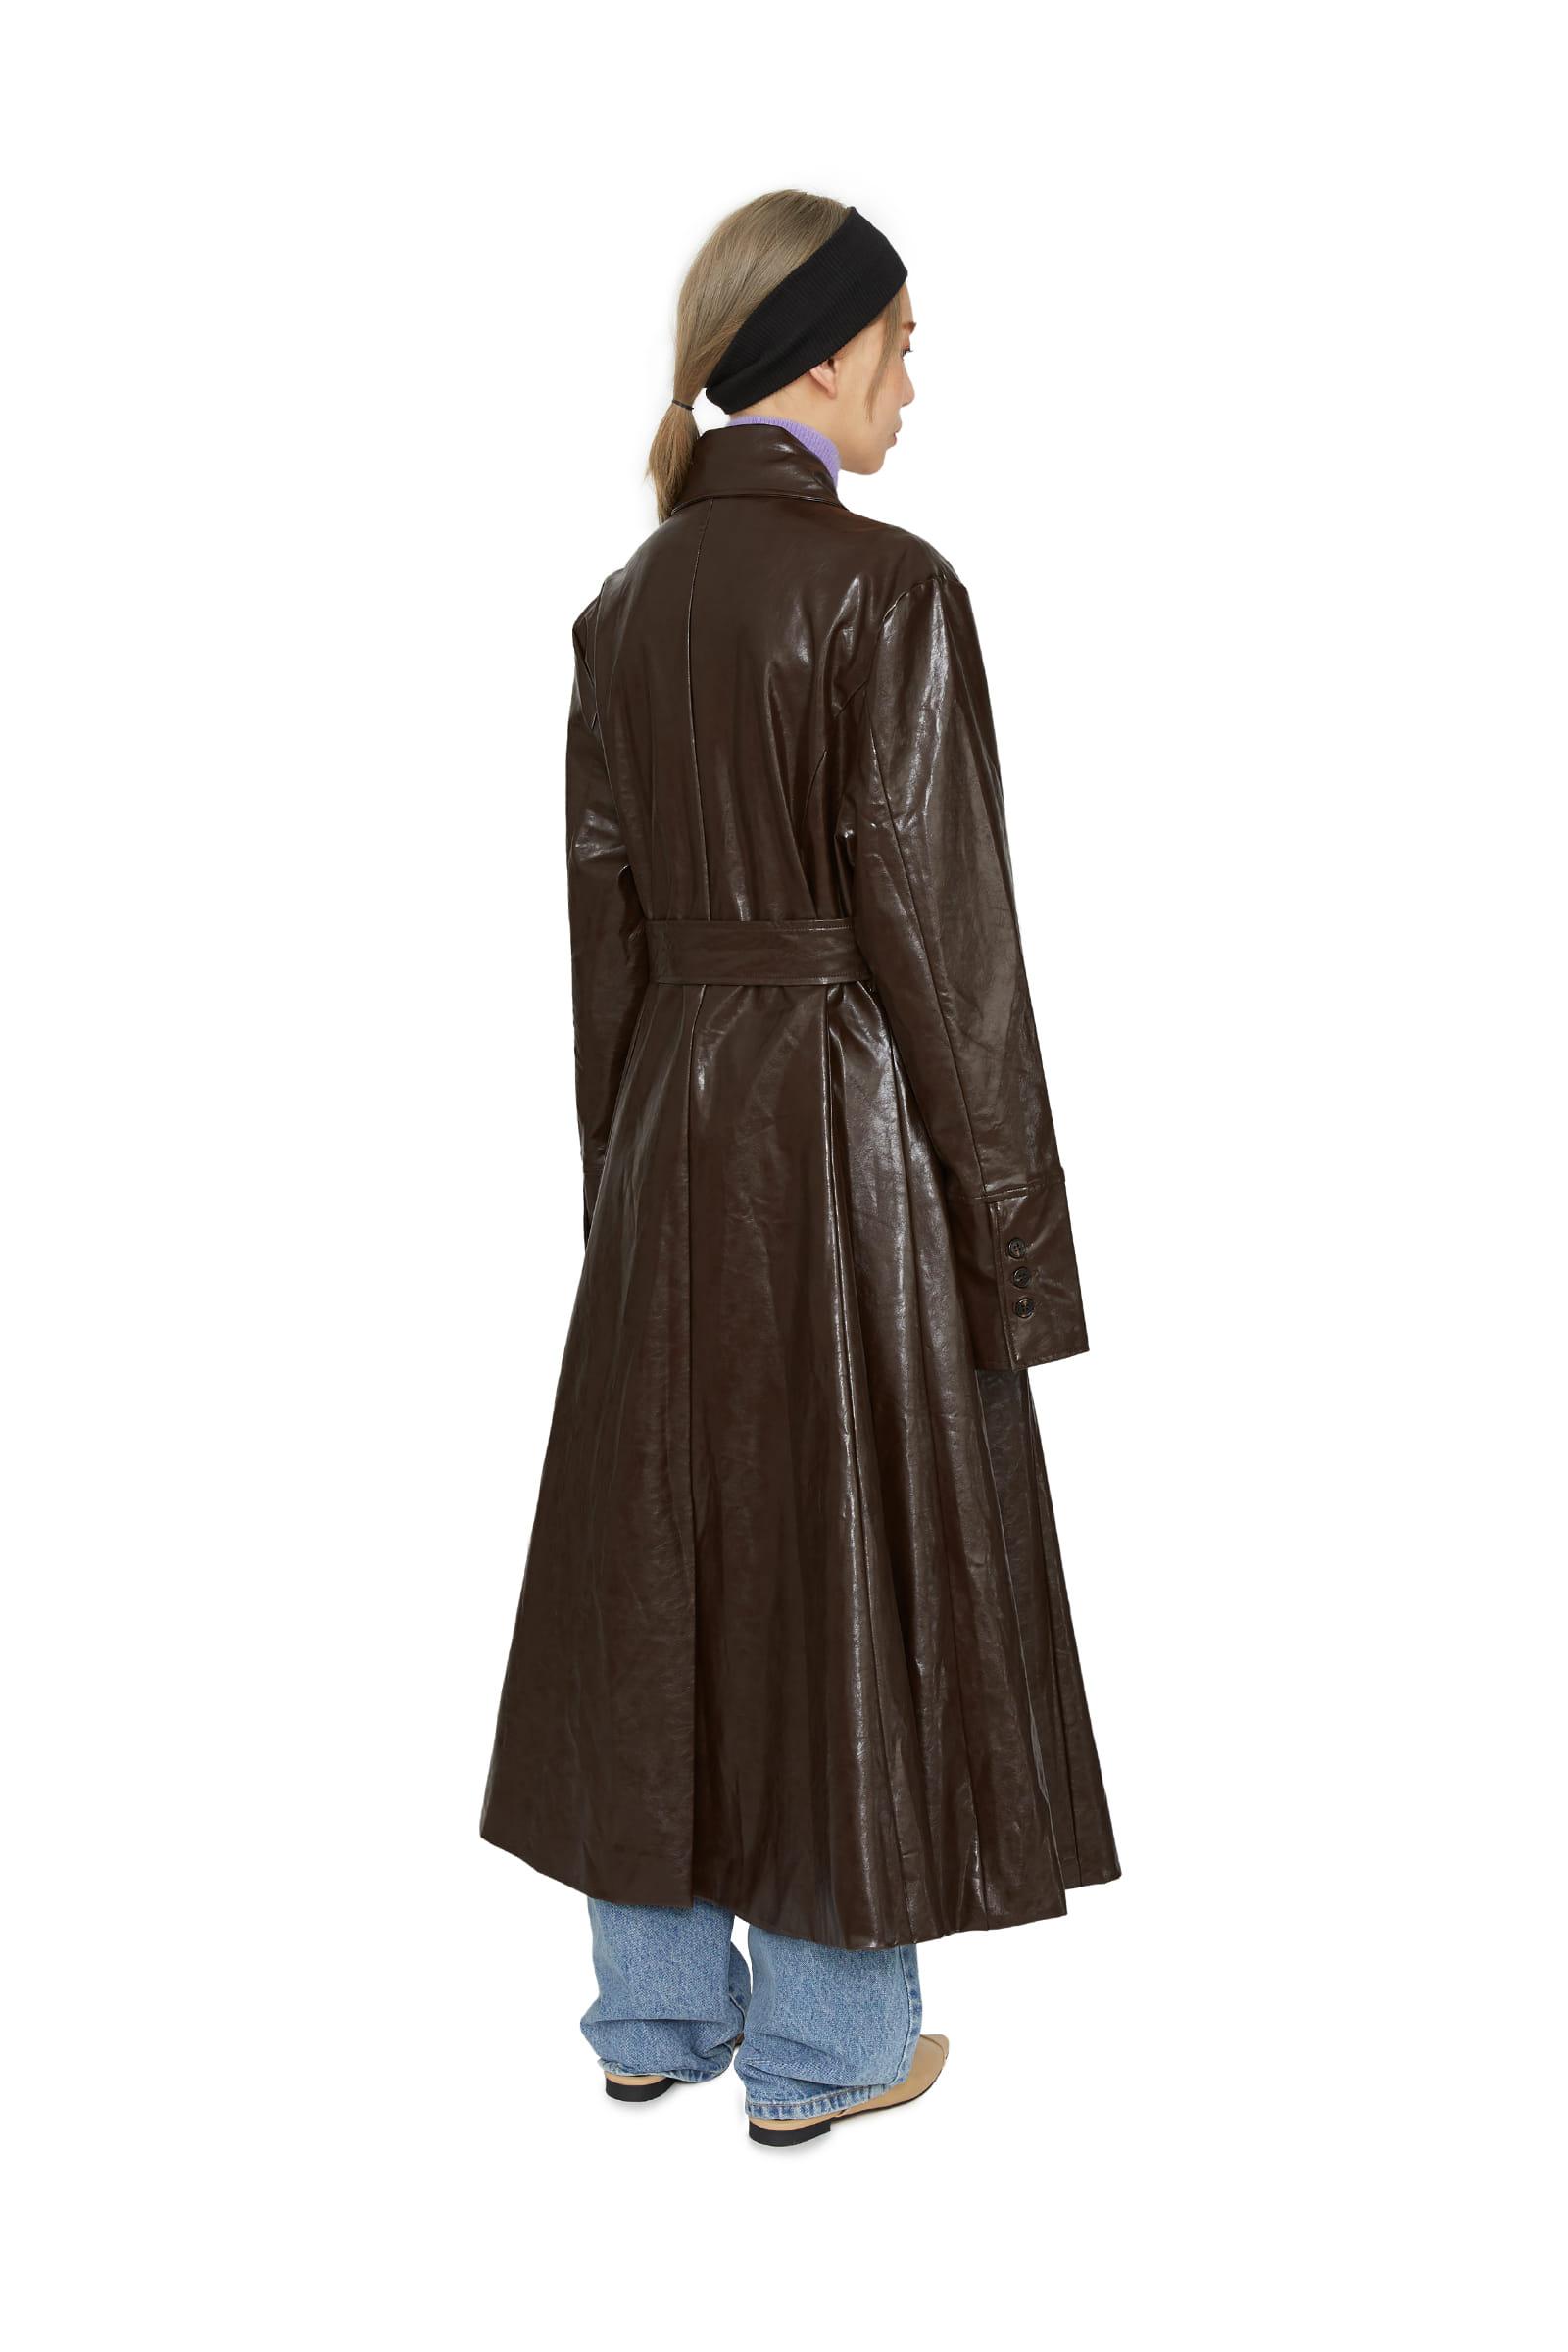 Brain Shine Leather Trench Coat